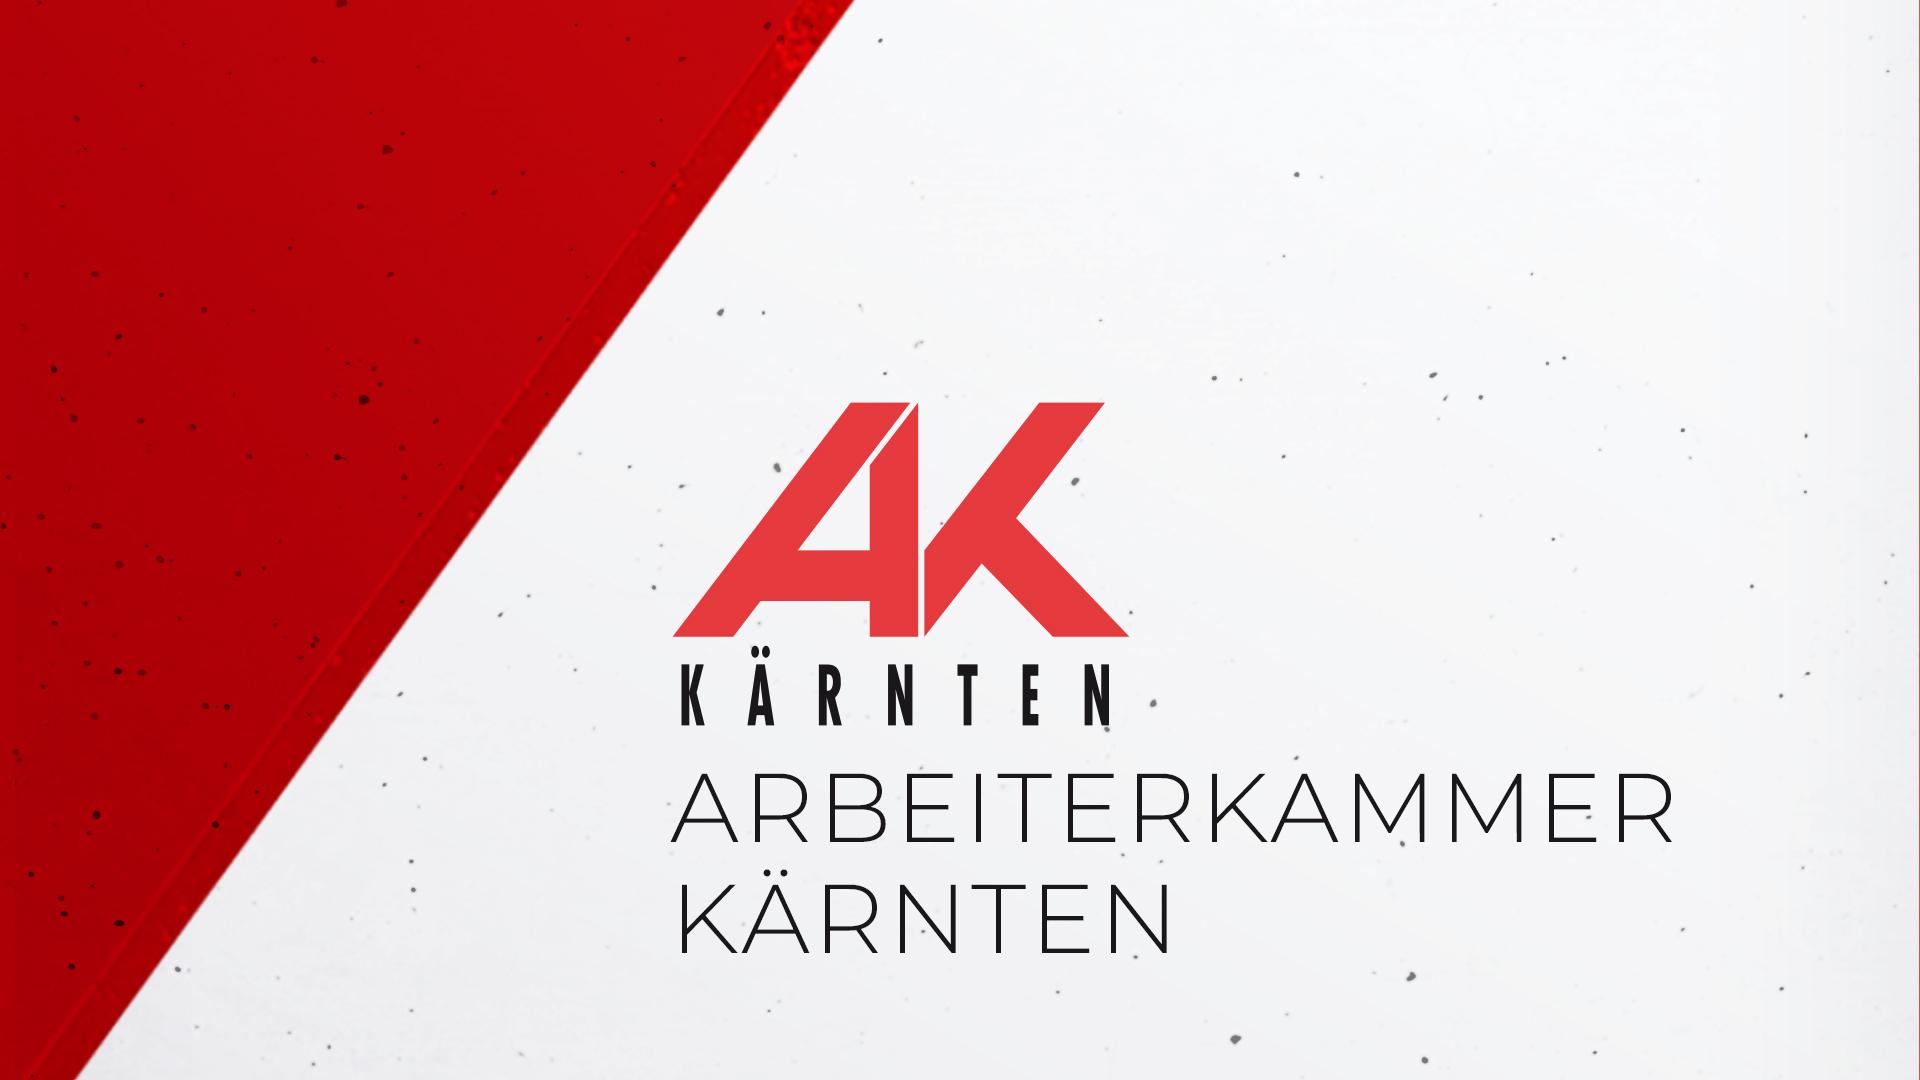 Arbeiterkammer Kärnten Arbeiterkammer Kärnten